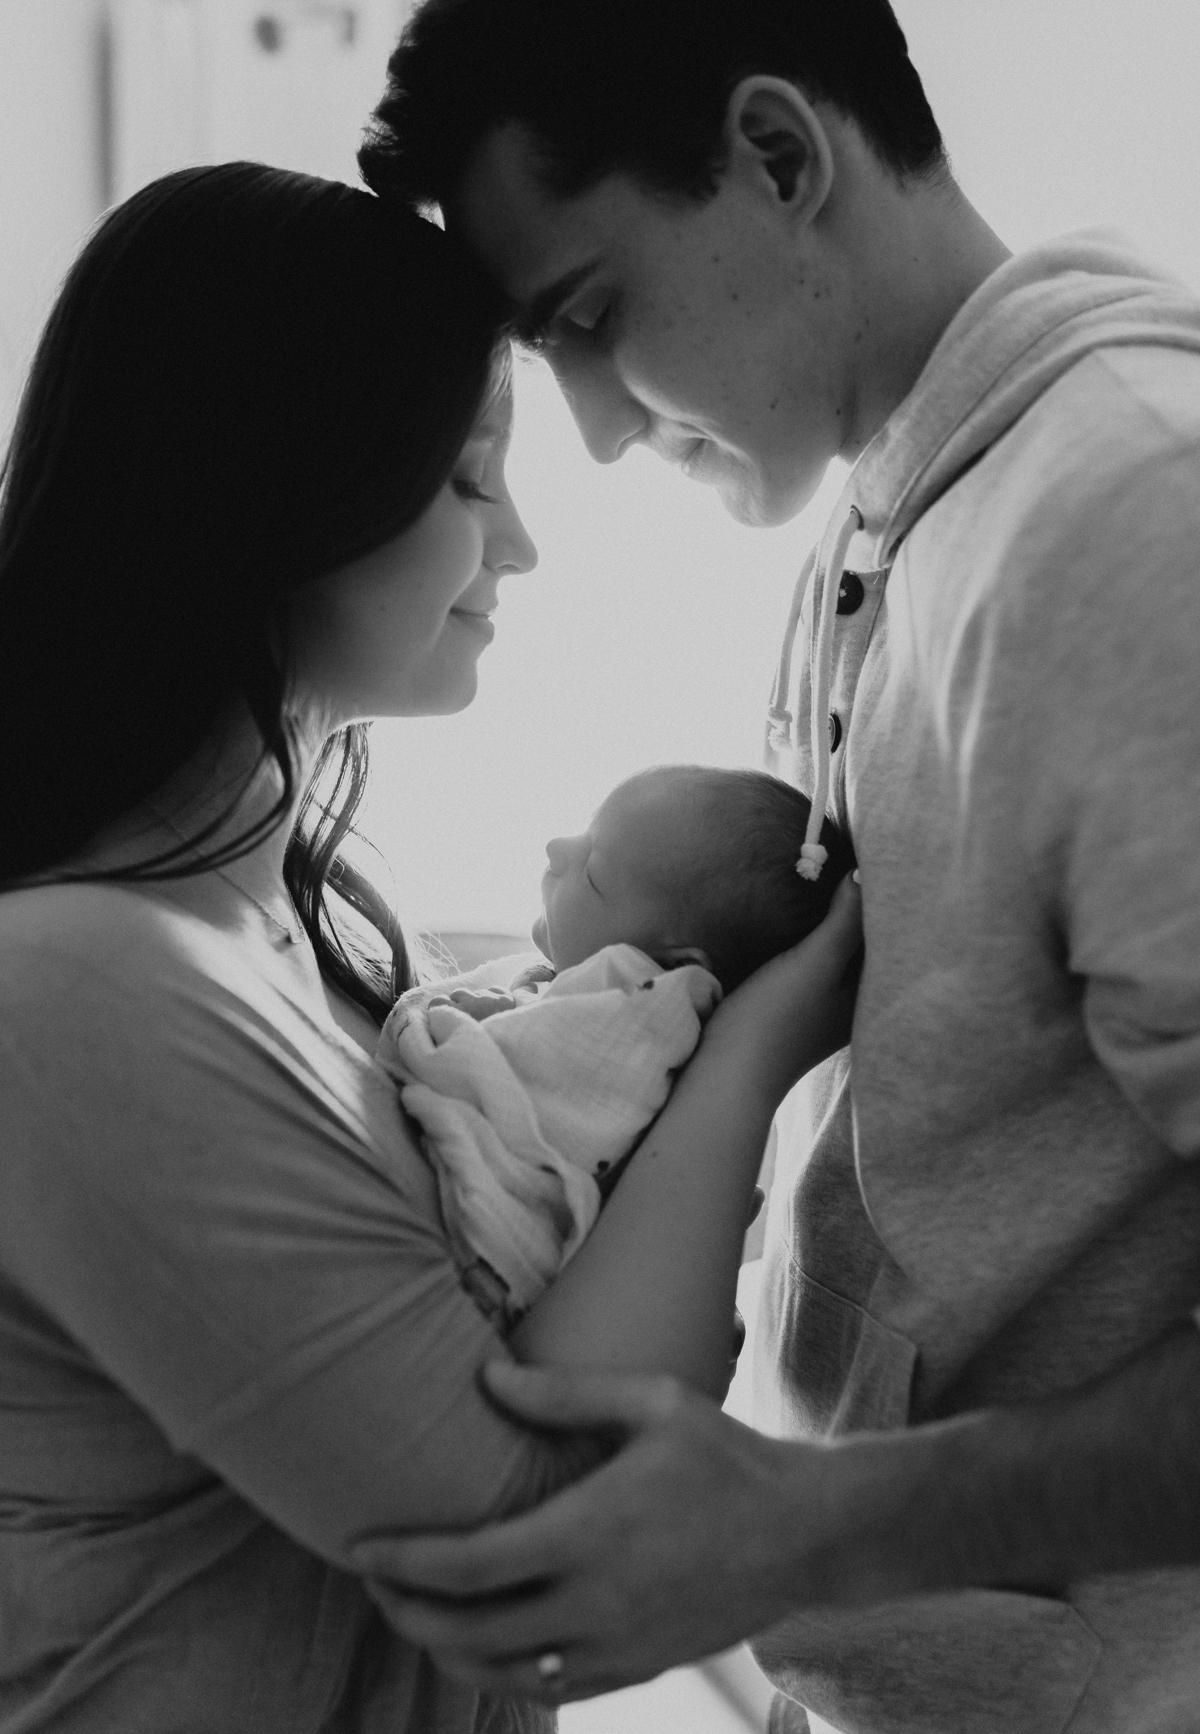 Megan Claire Photography   Arizona Newborn Photographer. Phoenix In Home Newborn portrait session @meganclairephoto